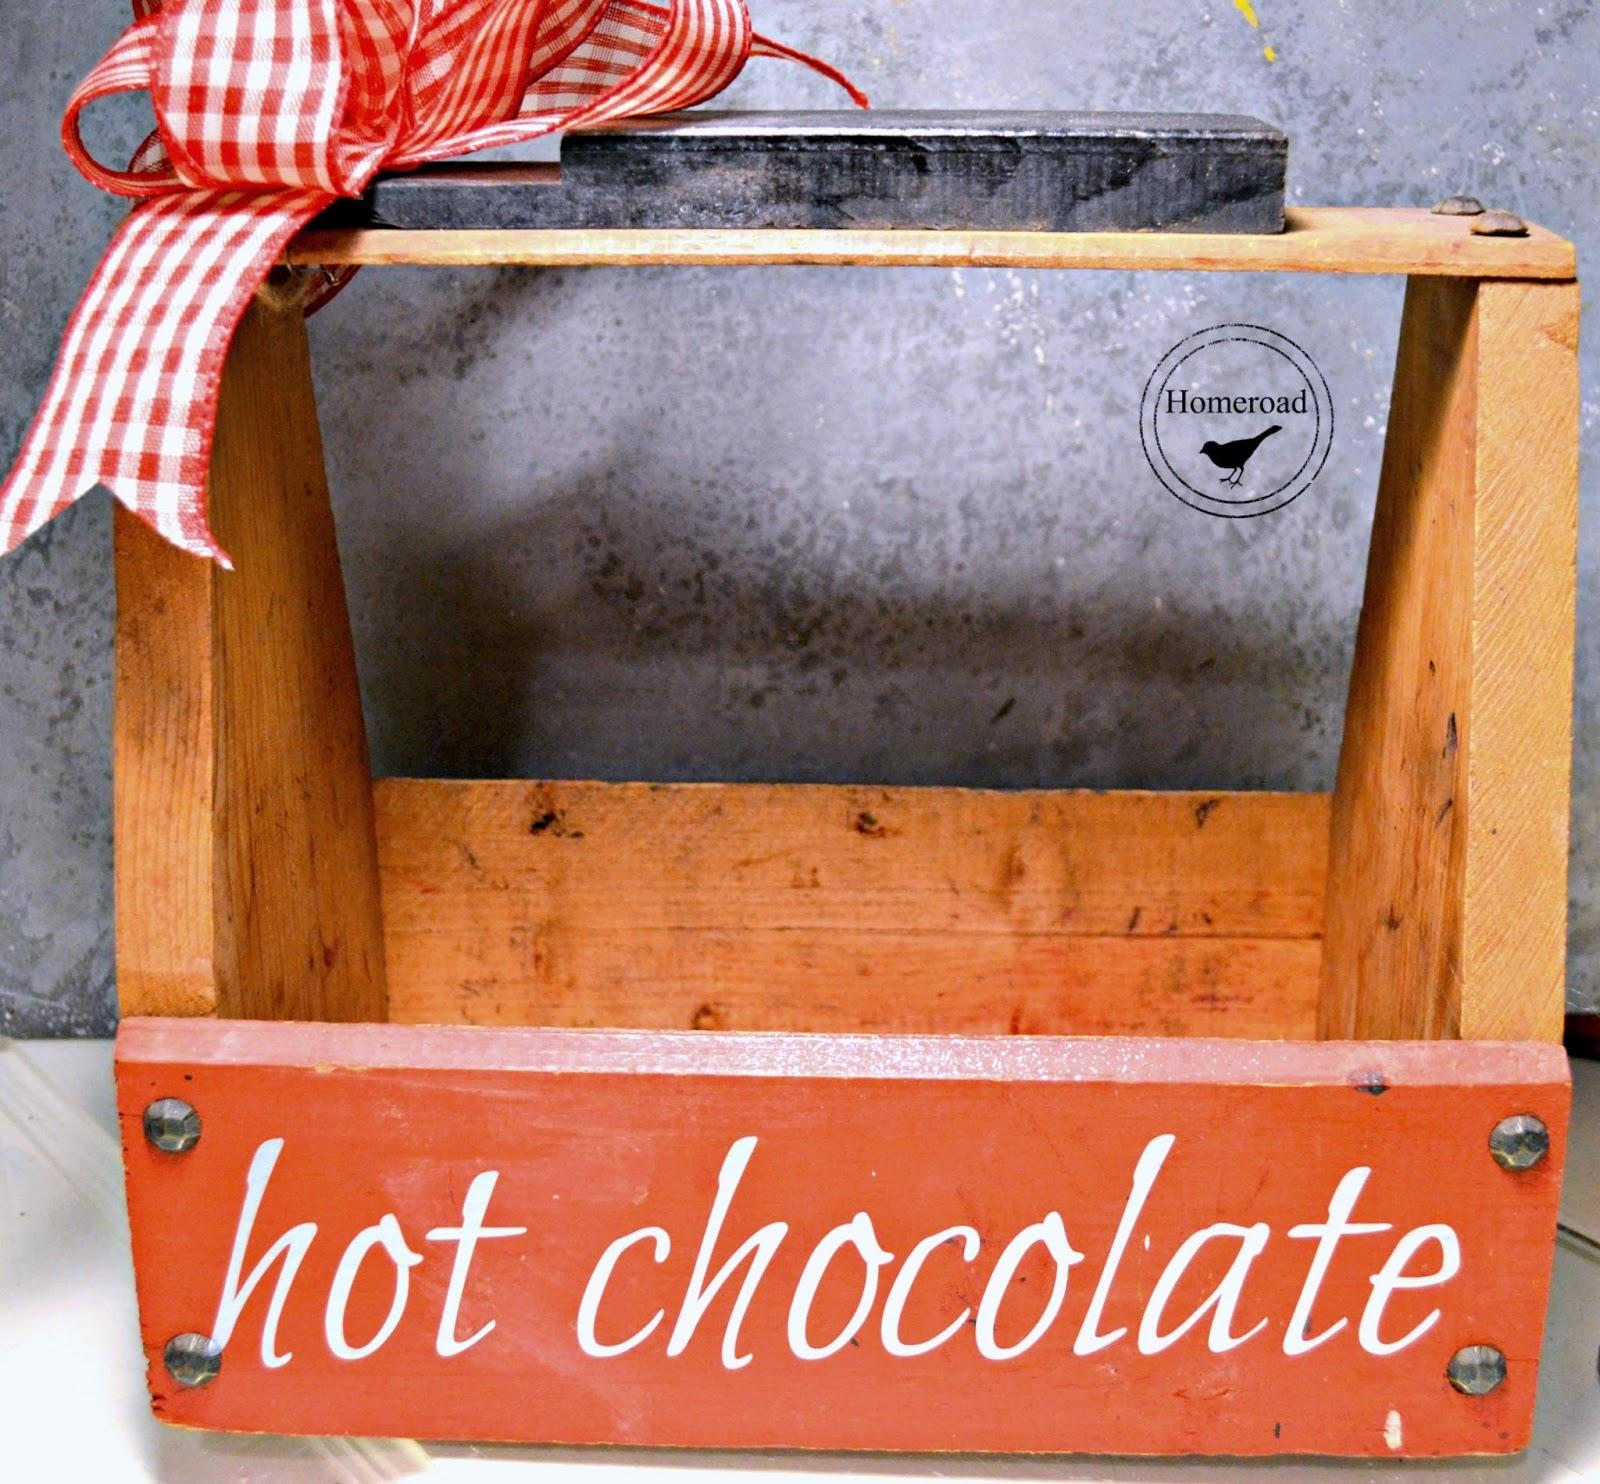 Hot Chocolate Tote www.homeroad.net